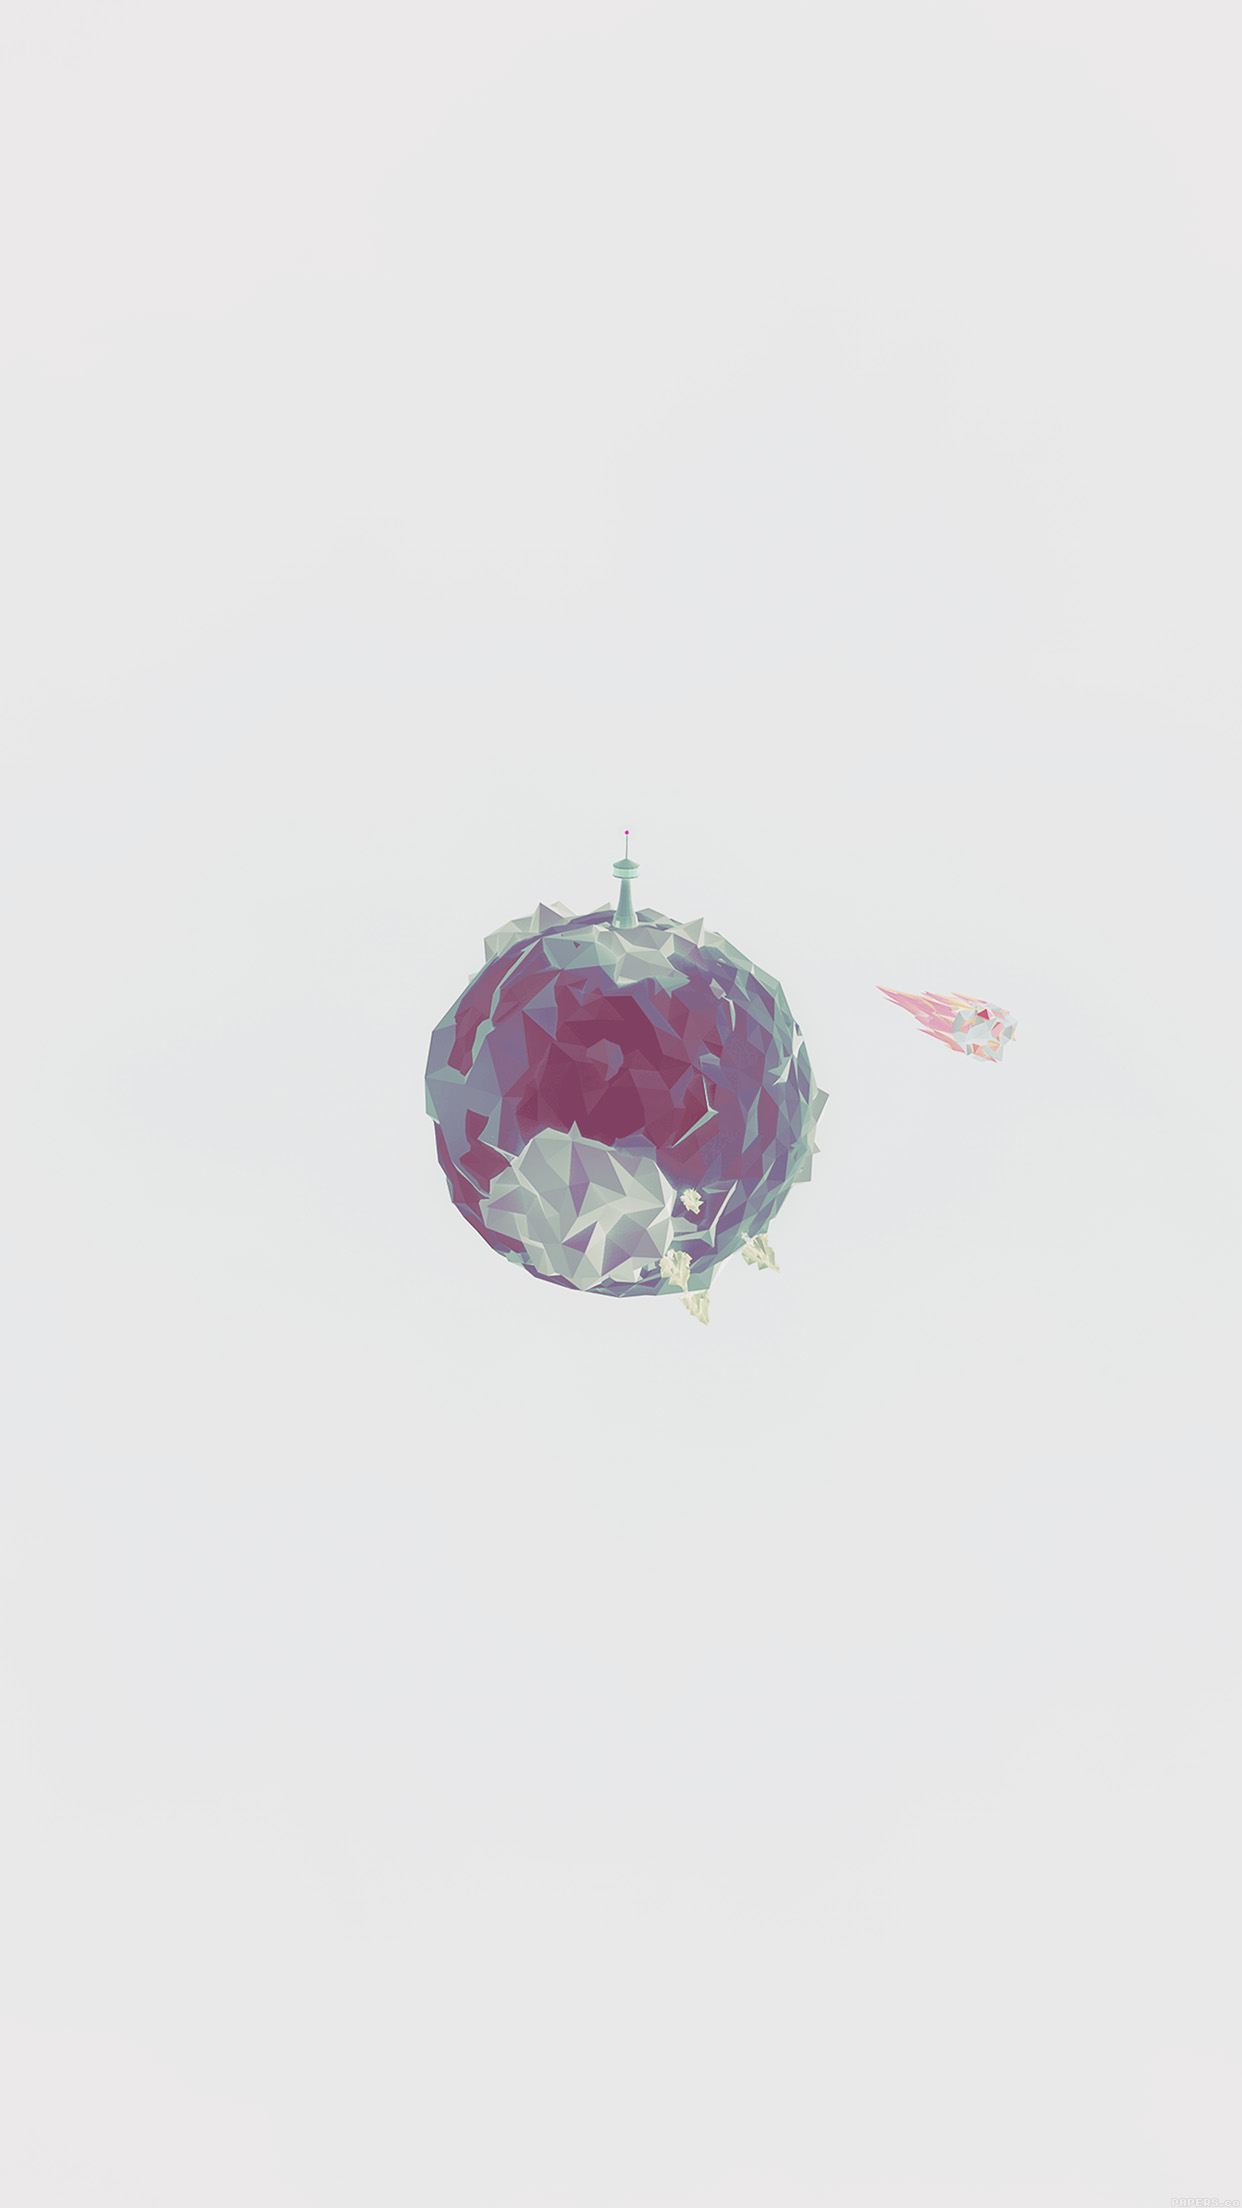 Iphone Wallpaper Cloud Aj33 Polygon Planet Cute Minimal Simple Art White Wallpaper